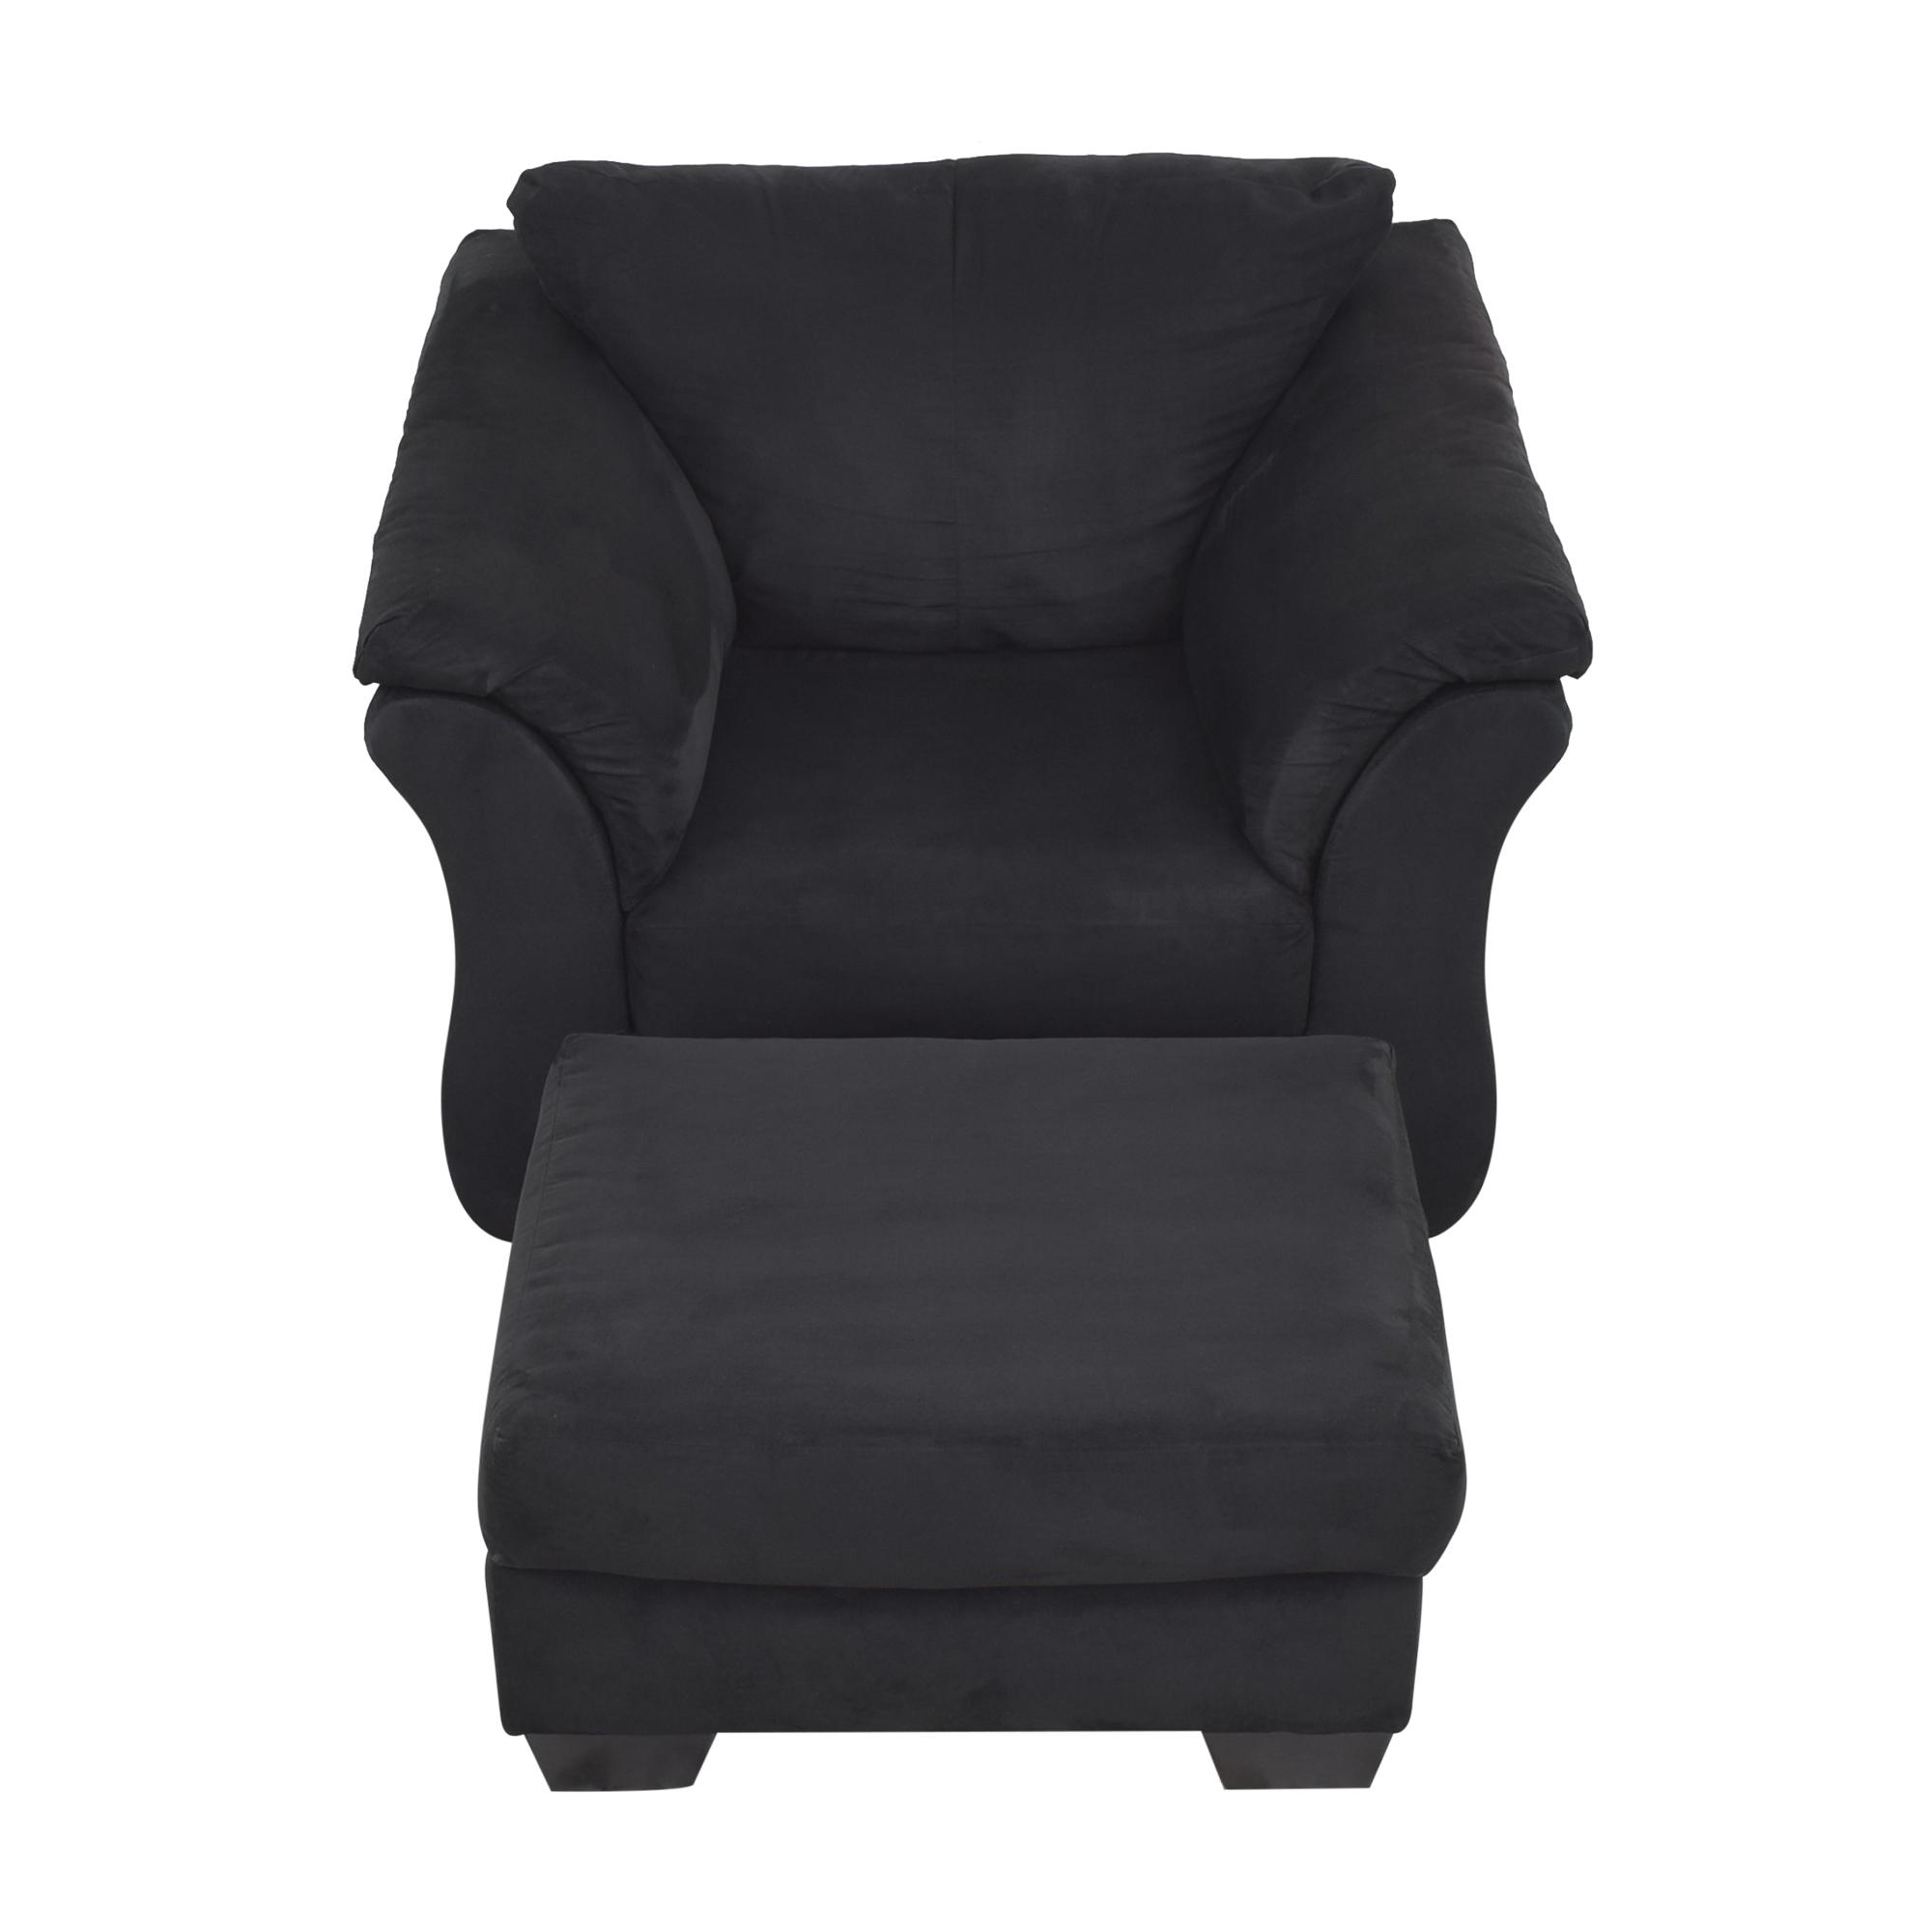 Ashley Furniture Ashley Furniture Darcy Cobblestone Chair and Ottoman dimensions